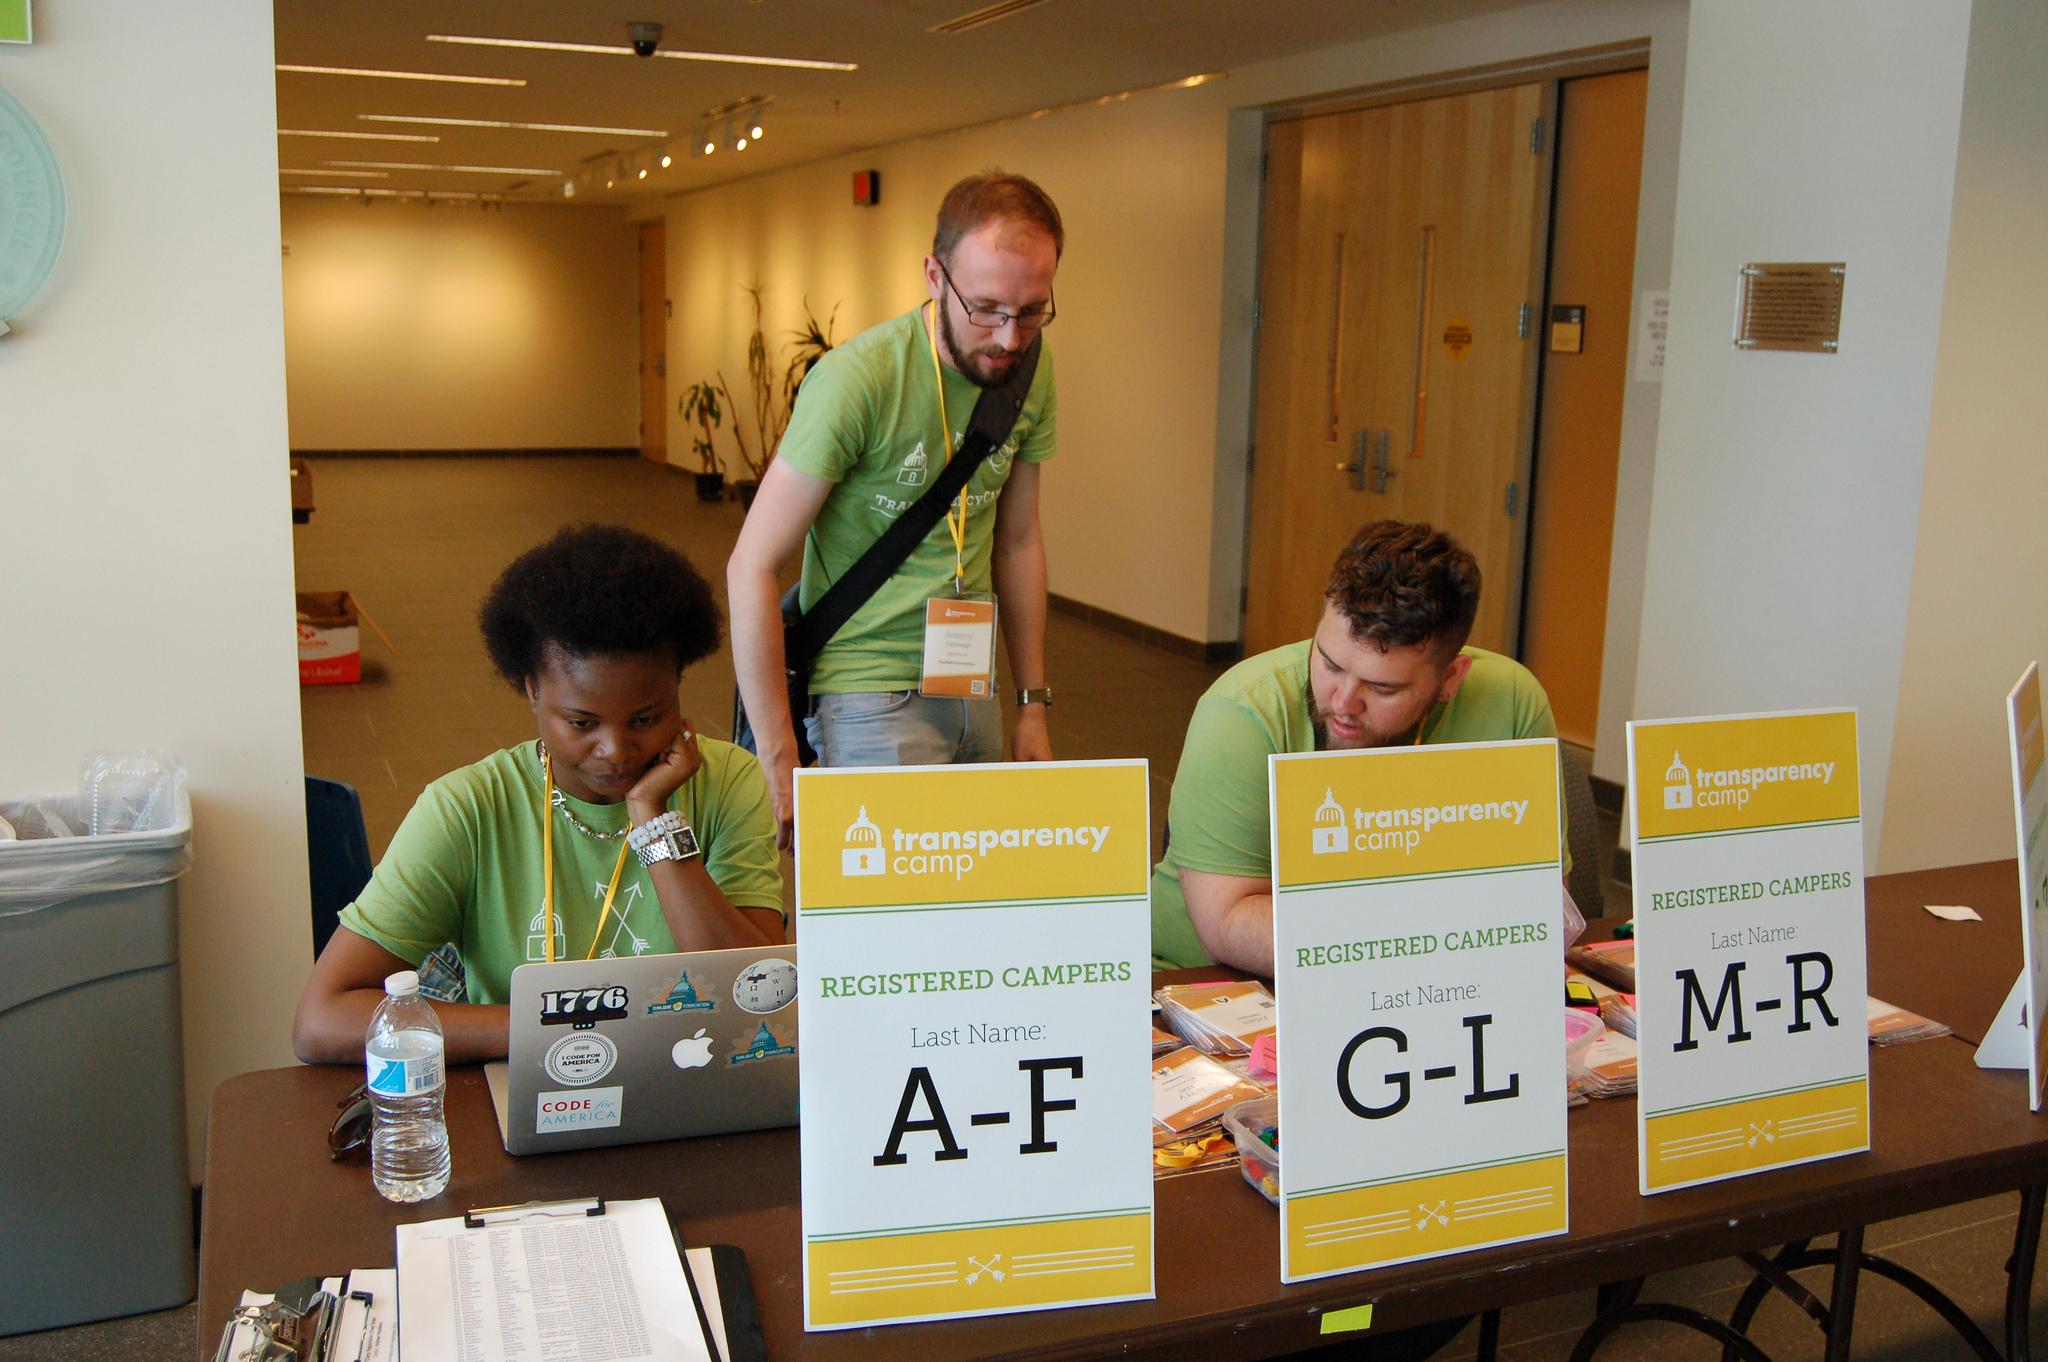 Registration desk signage helped people find their badges quickly